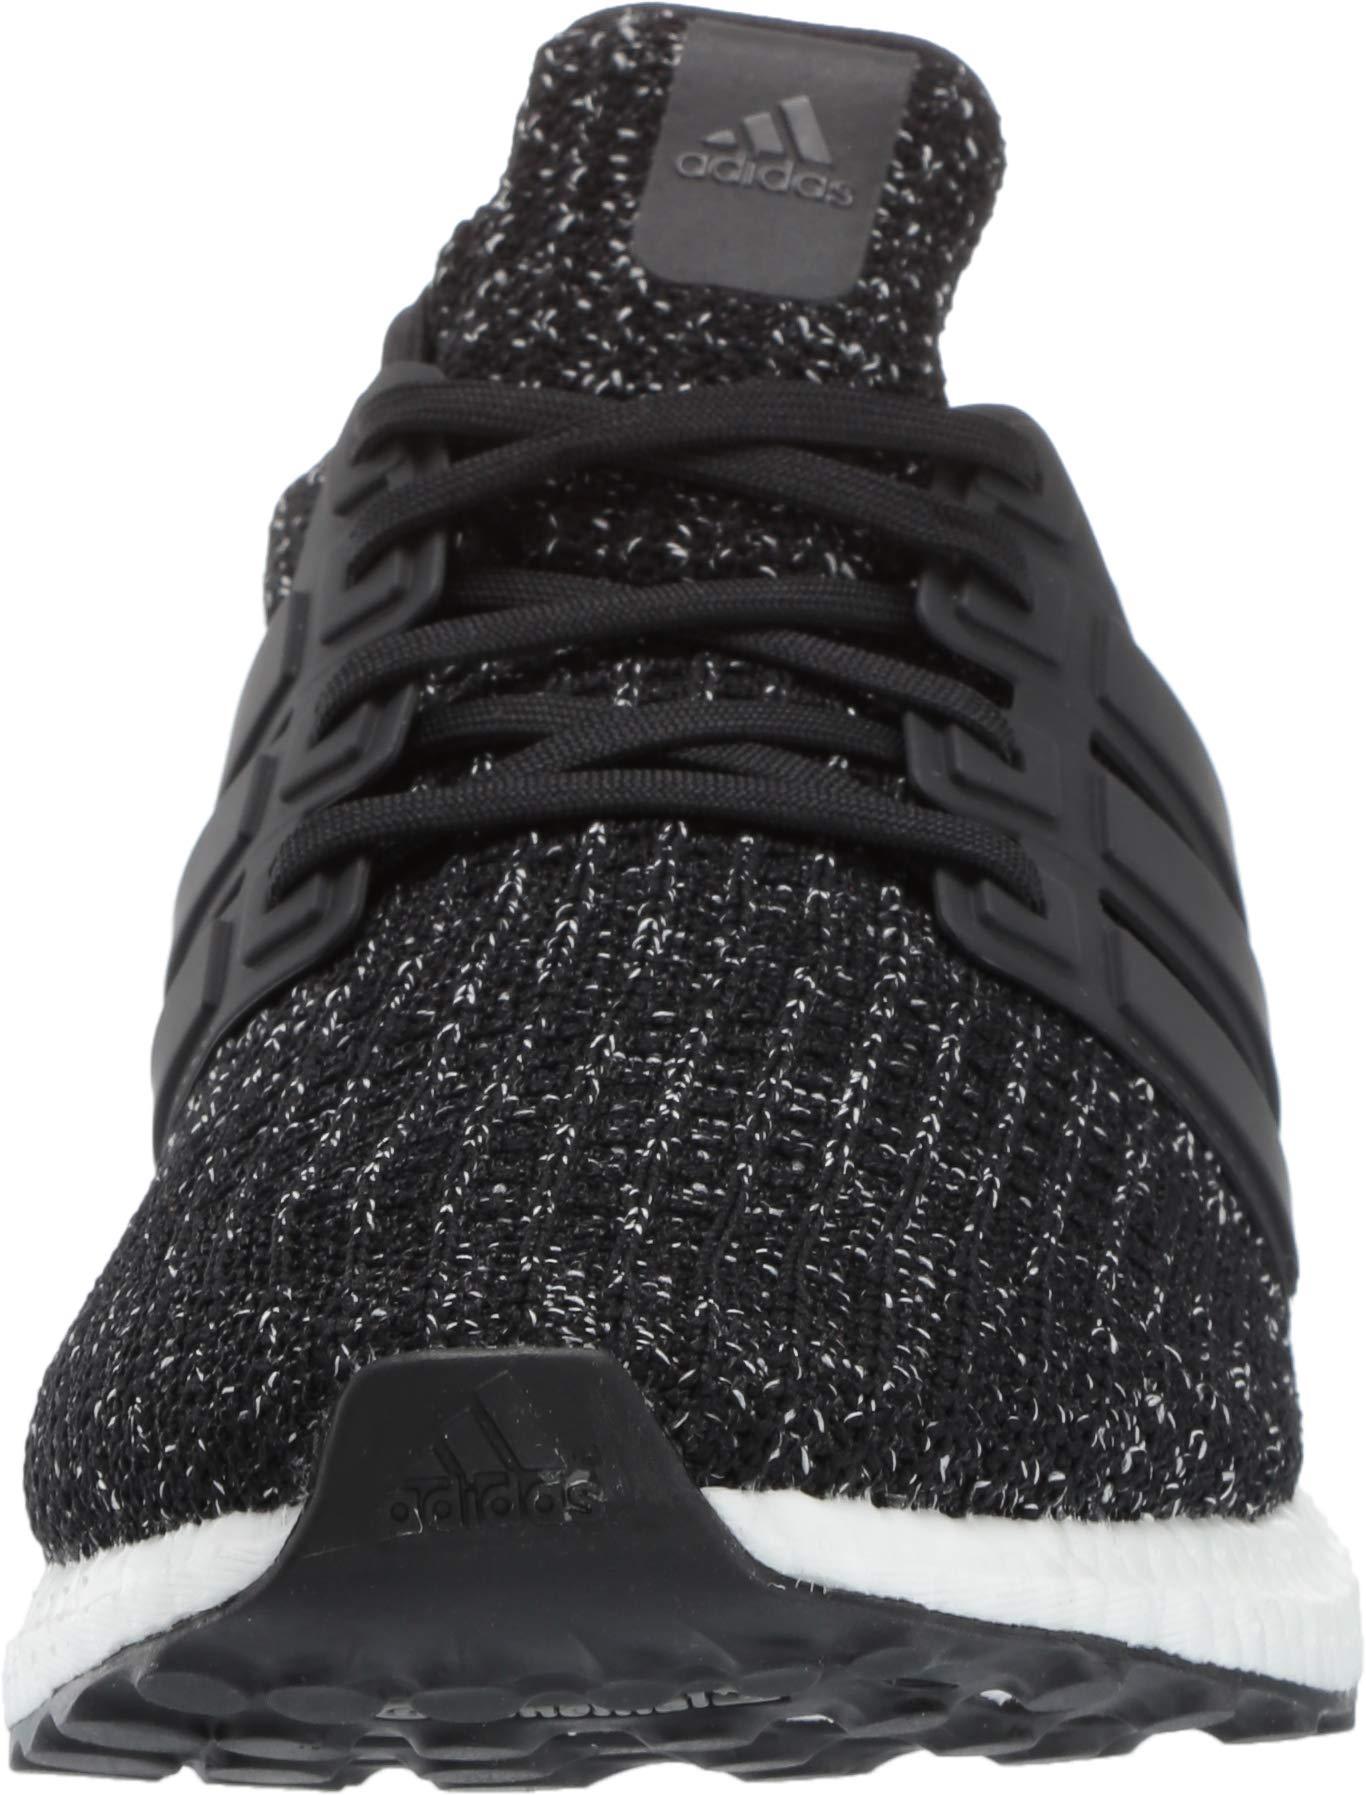 adidas Men's Ultraboost, Black/White, 9 M US by adidas (Image #4)